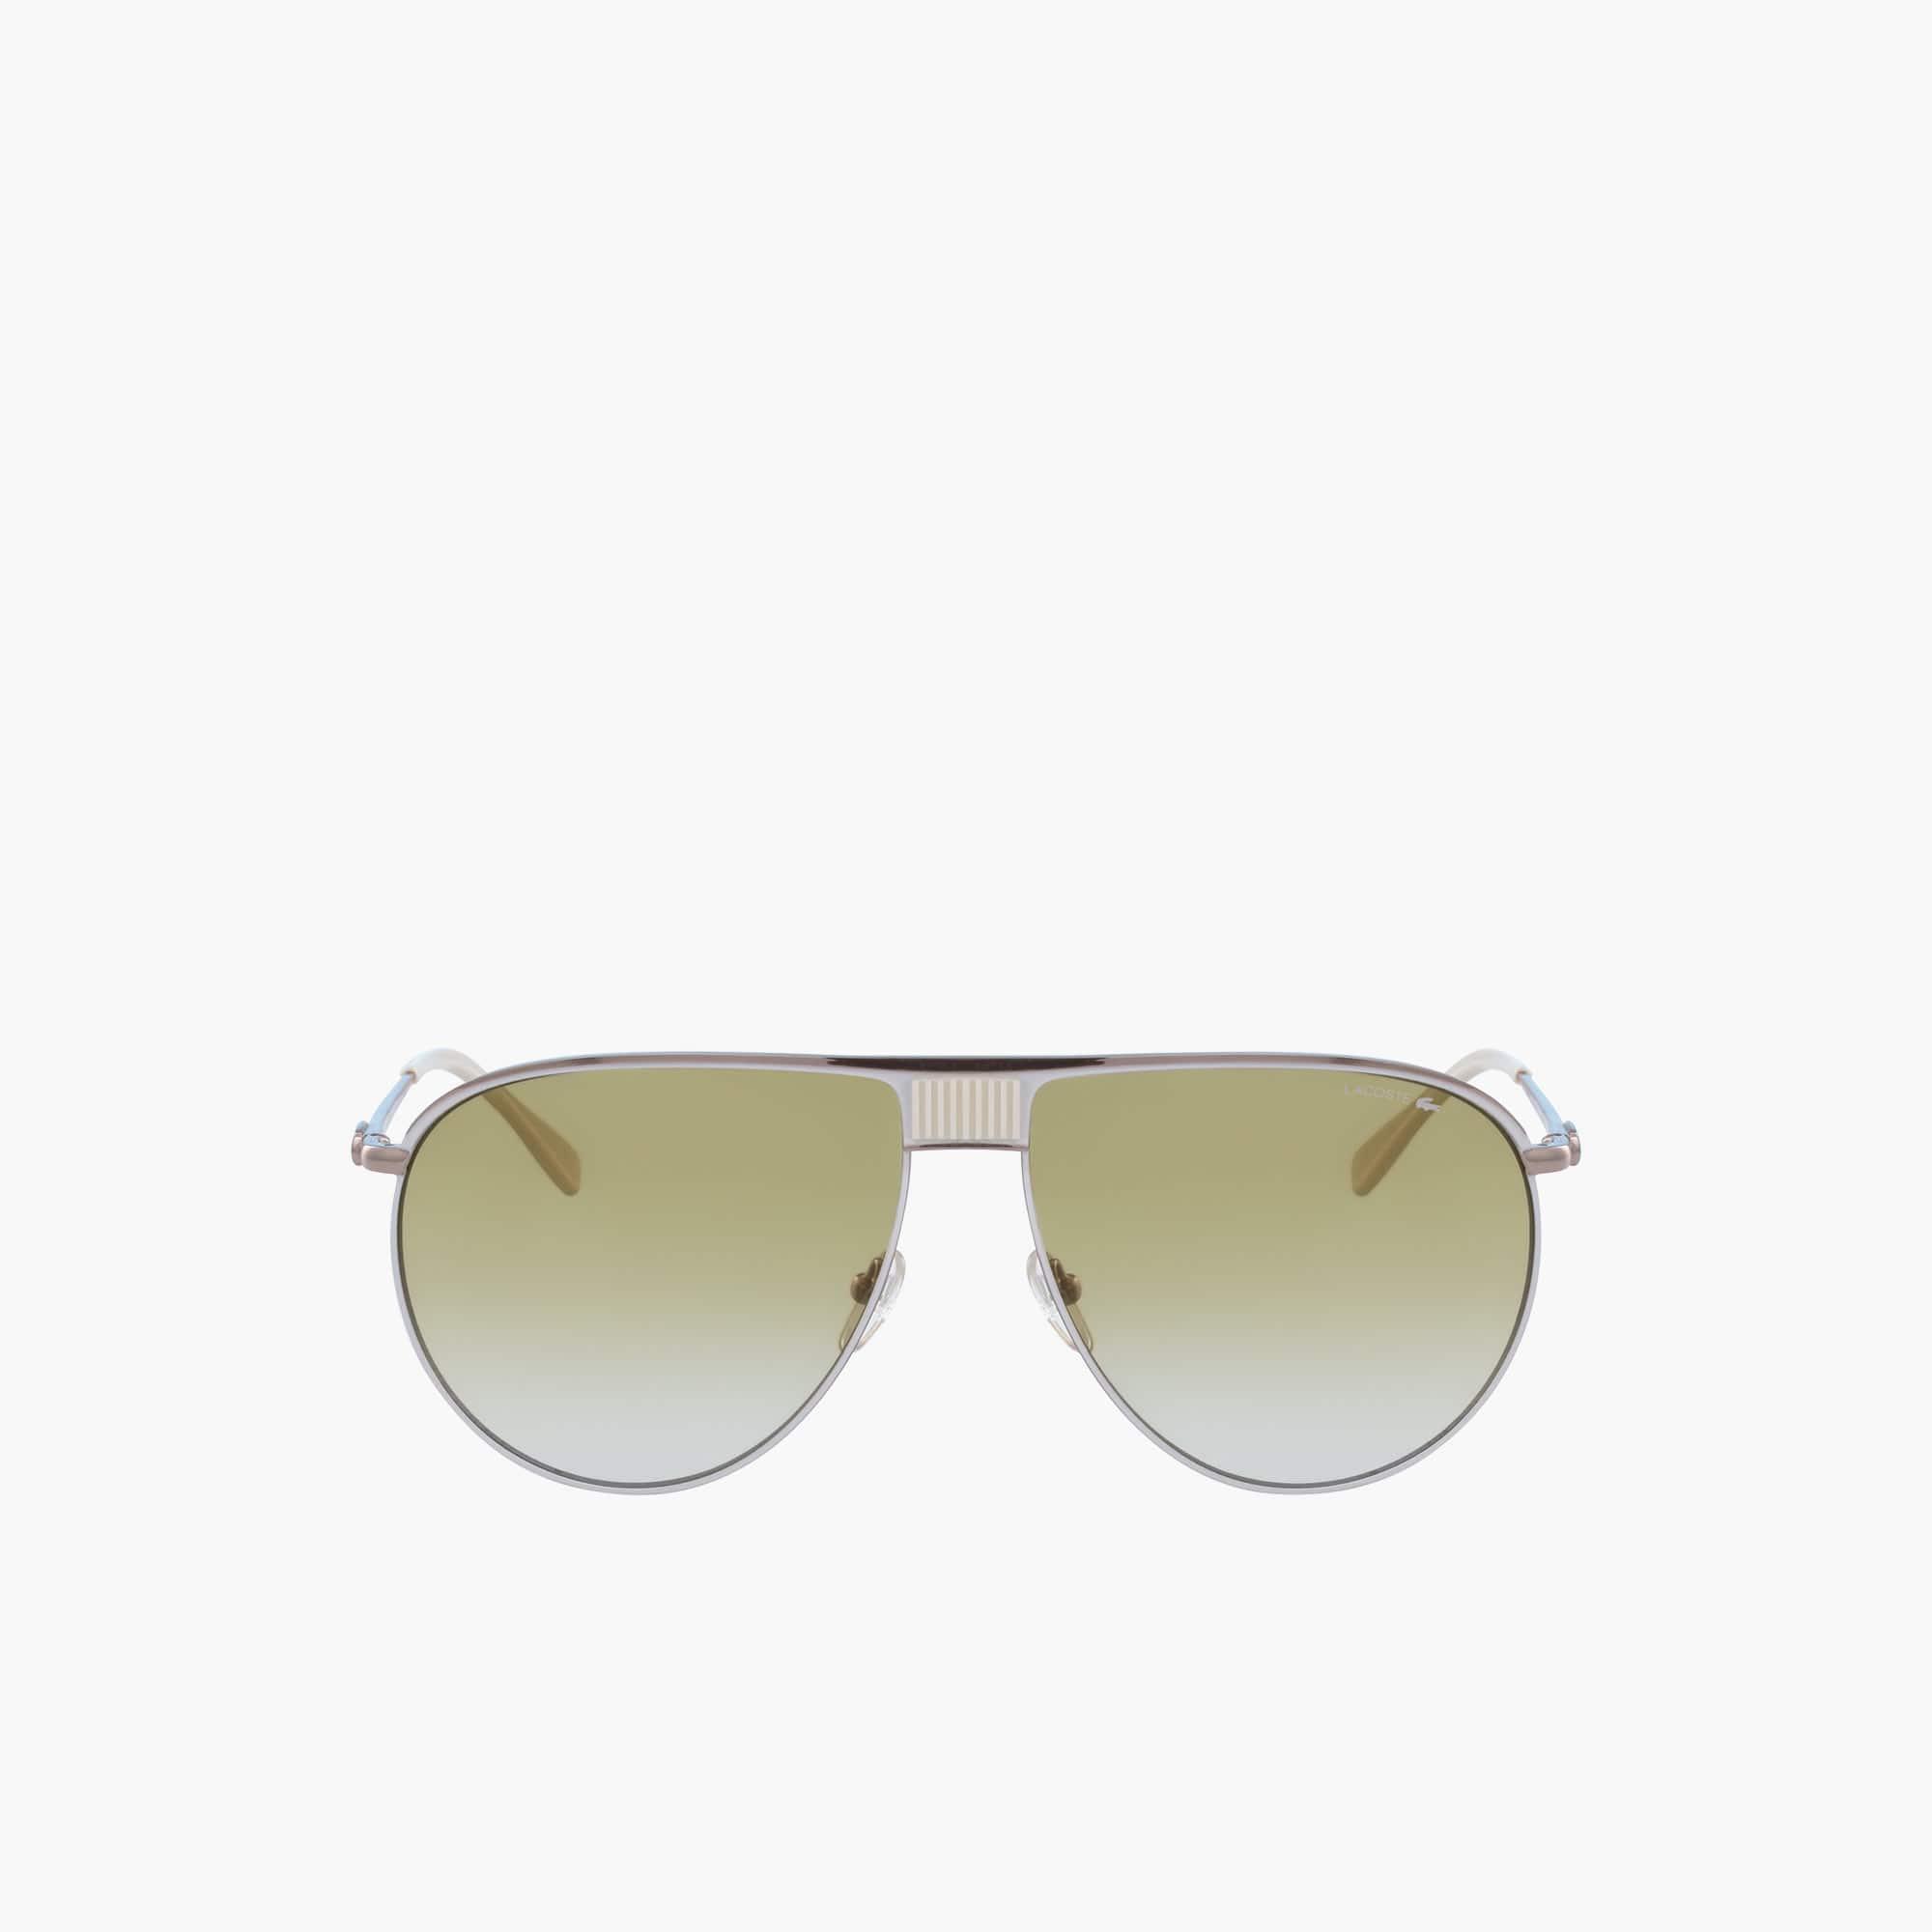 Unisex Fashion Show Sunglasses in Metal